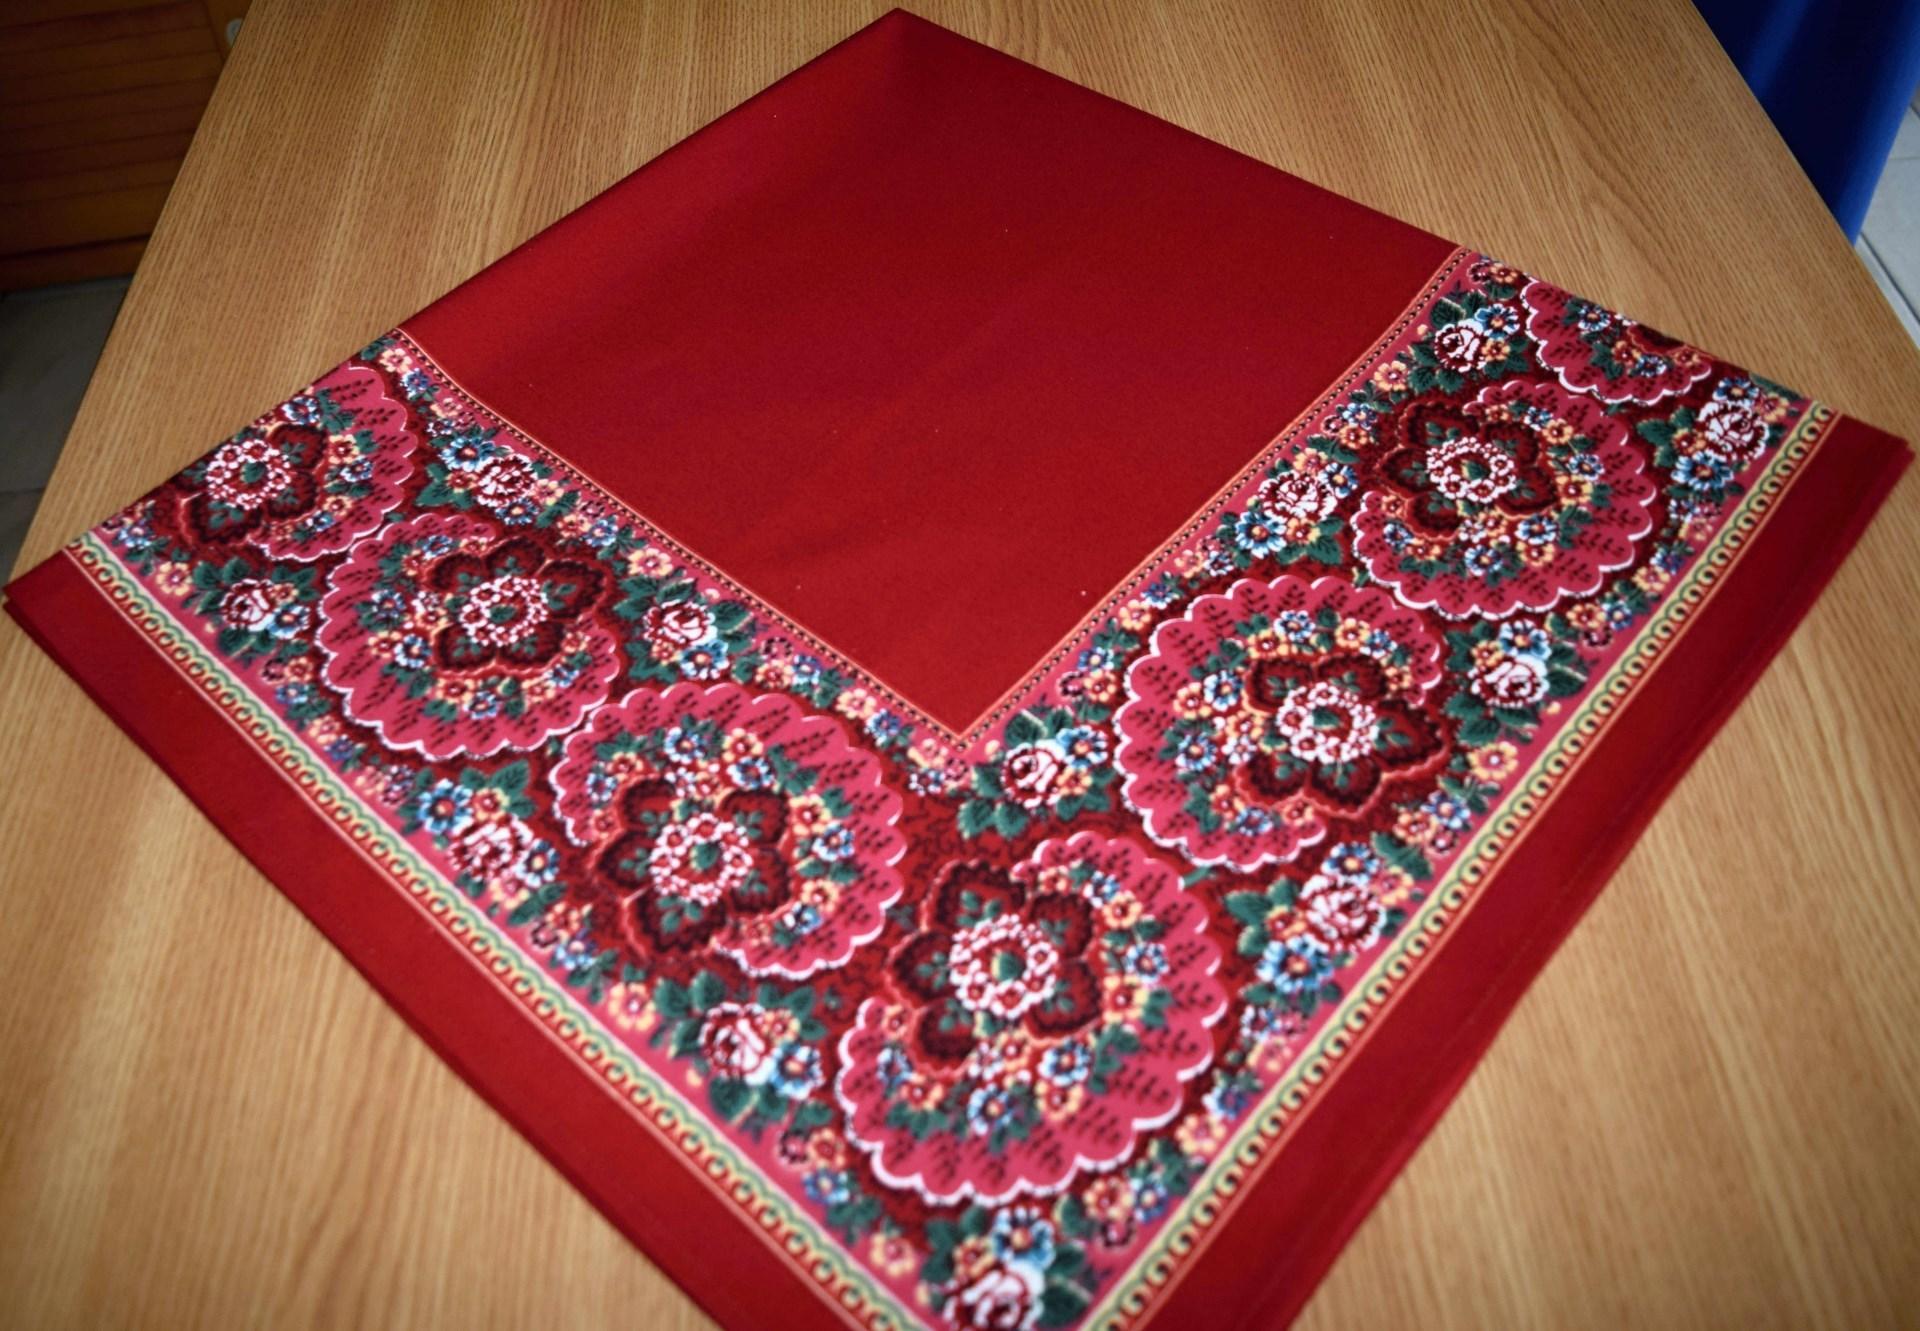 bbcb6f060b2 Turecký šátek - vzor III. velikost 90x90 cm - prázdný střed